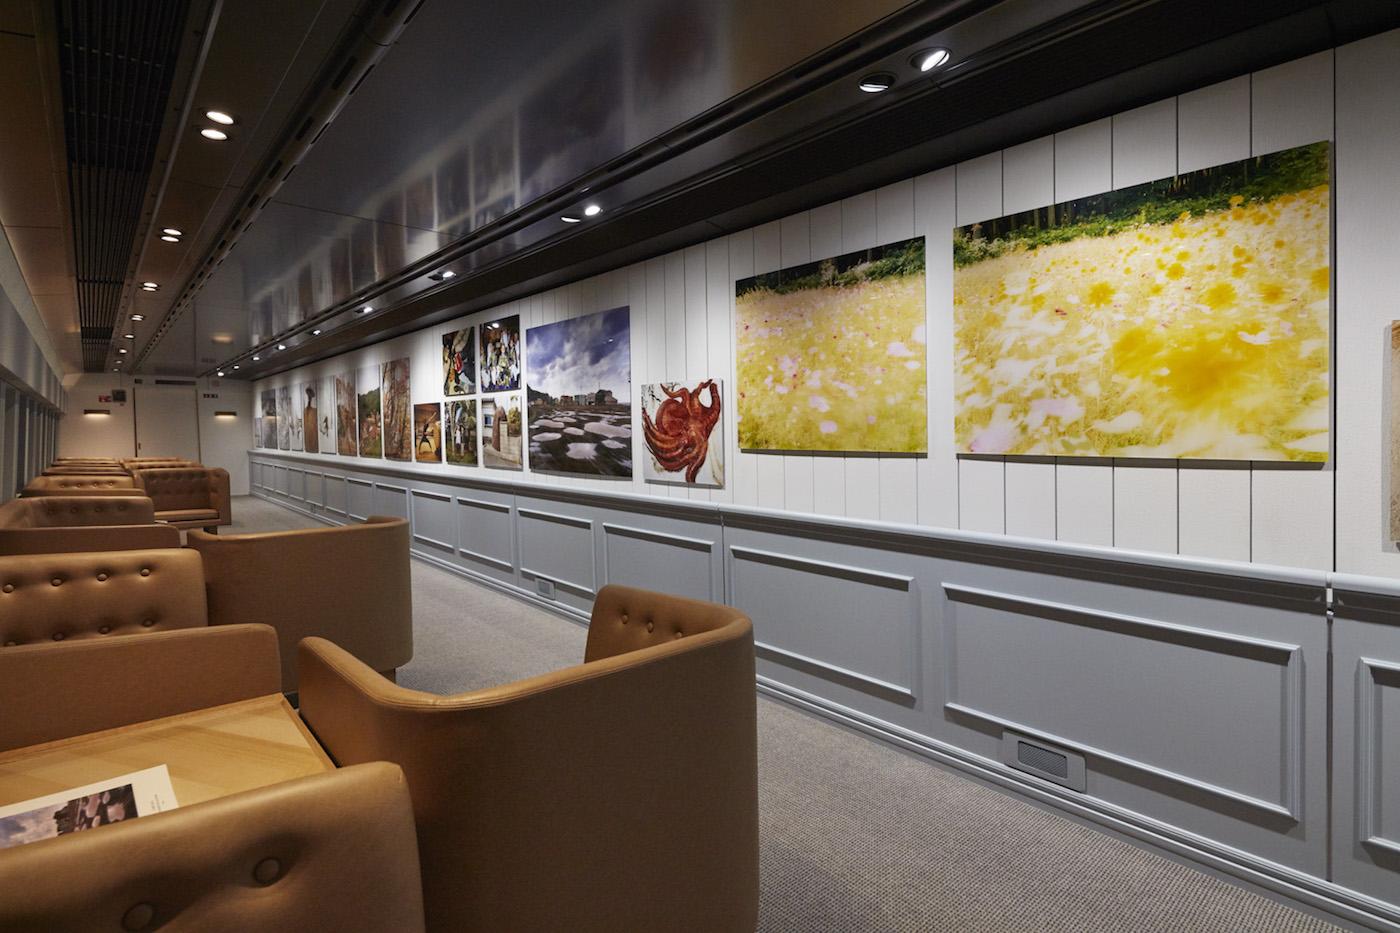 Works by Naoki Ishikawa aboard the Genbi Shinkansen (photo by Anson Smartto, courtesy Genbi Shinkansen)